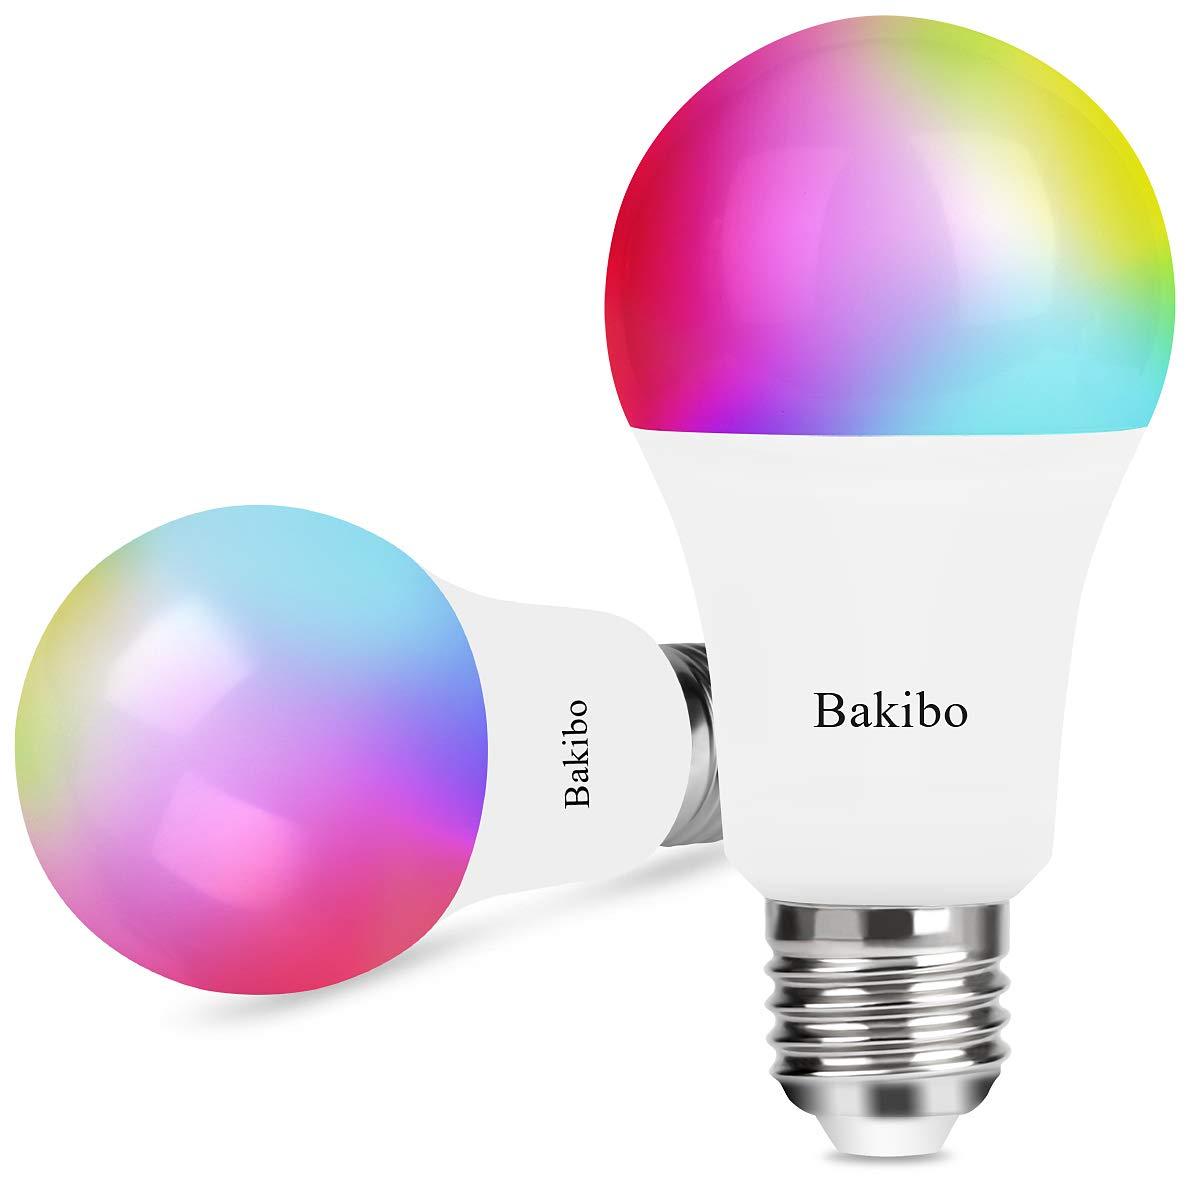 bakibo Smart WLAN LED Lampen Glühbirne Dimmbar 9W 1000Lm